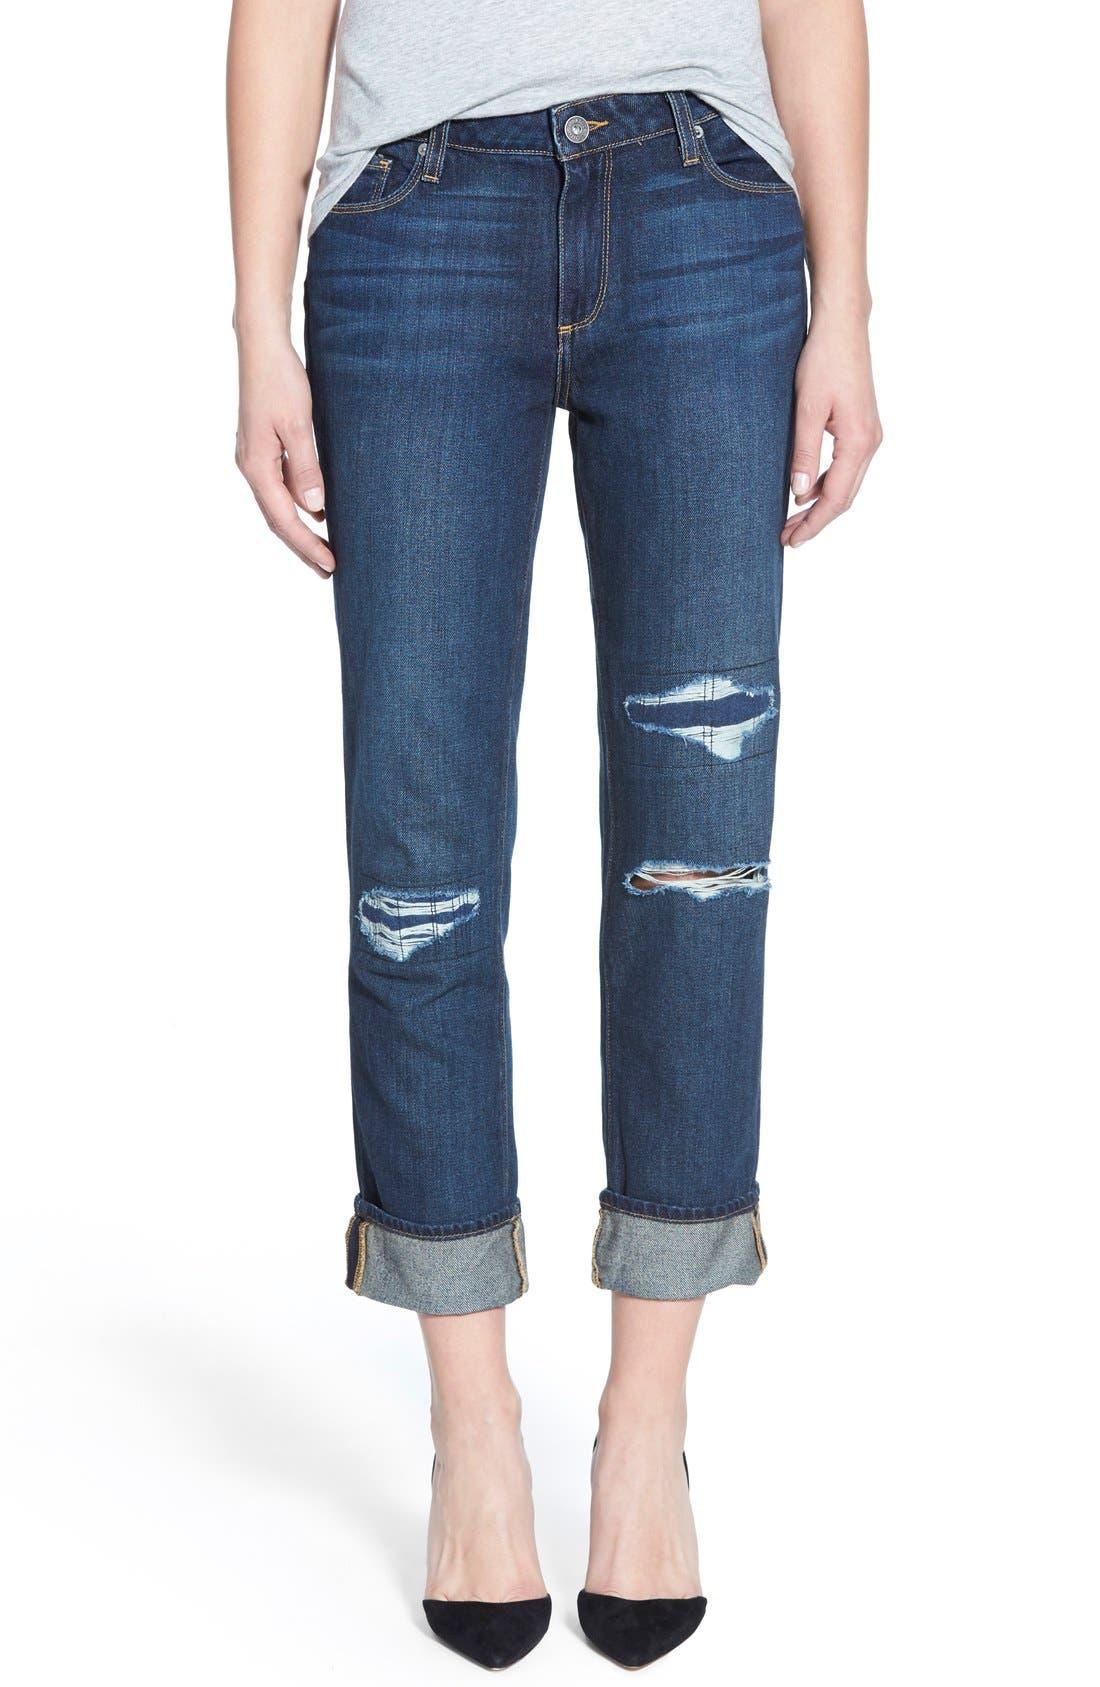 Alternate Image 1 Selected - Paige Denim 'Porter' Boyfriend Jeans (Talley Destructed)